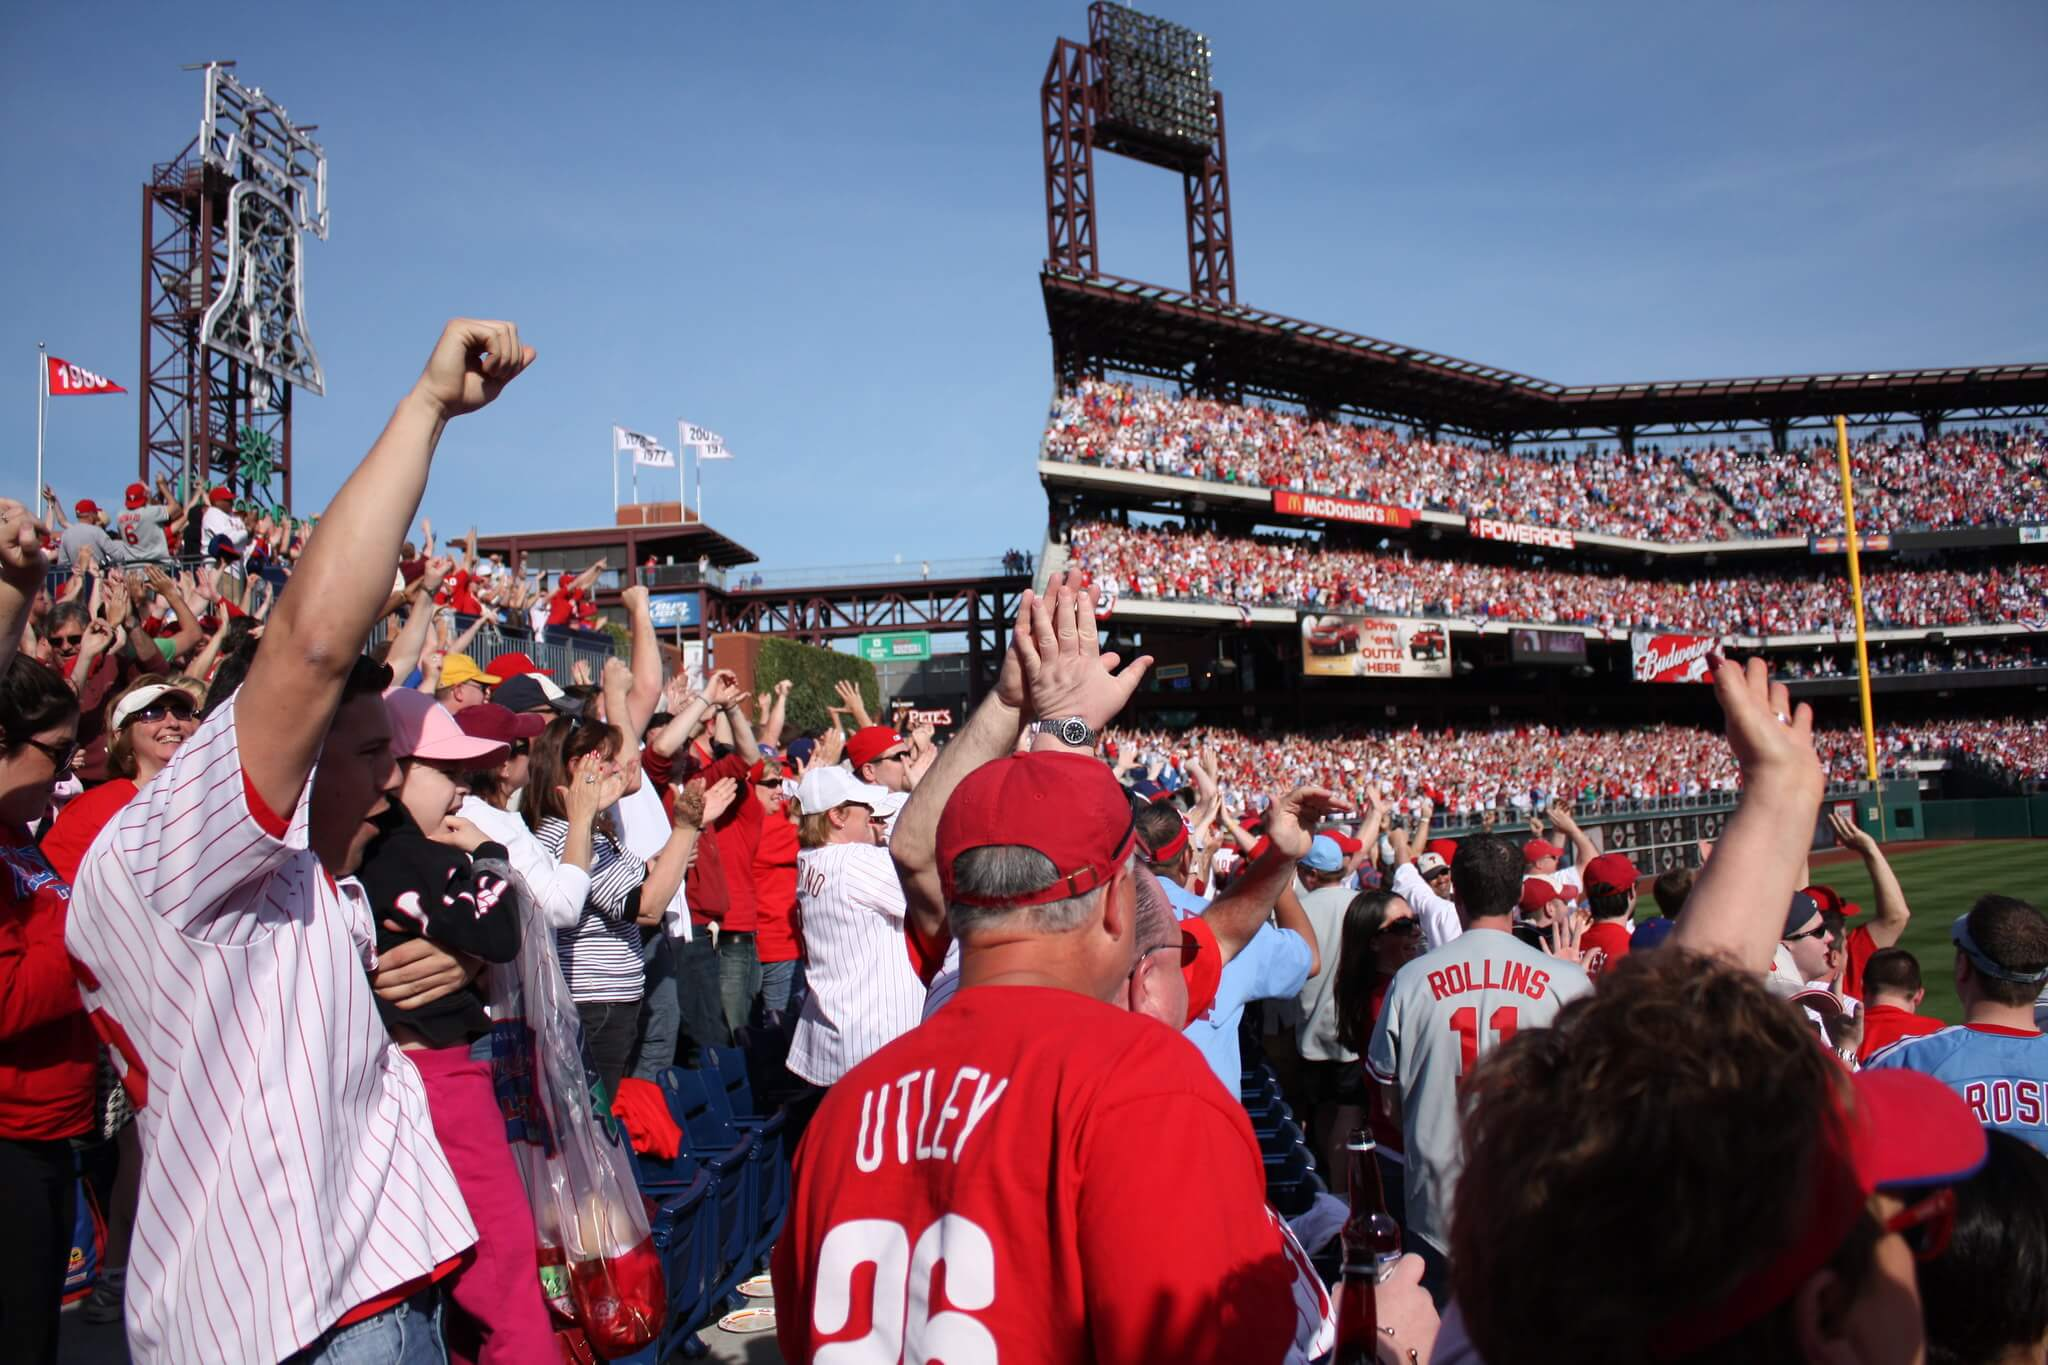 Philadelphia Phillies fans